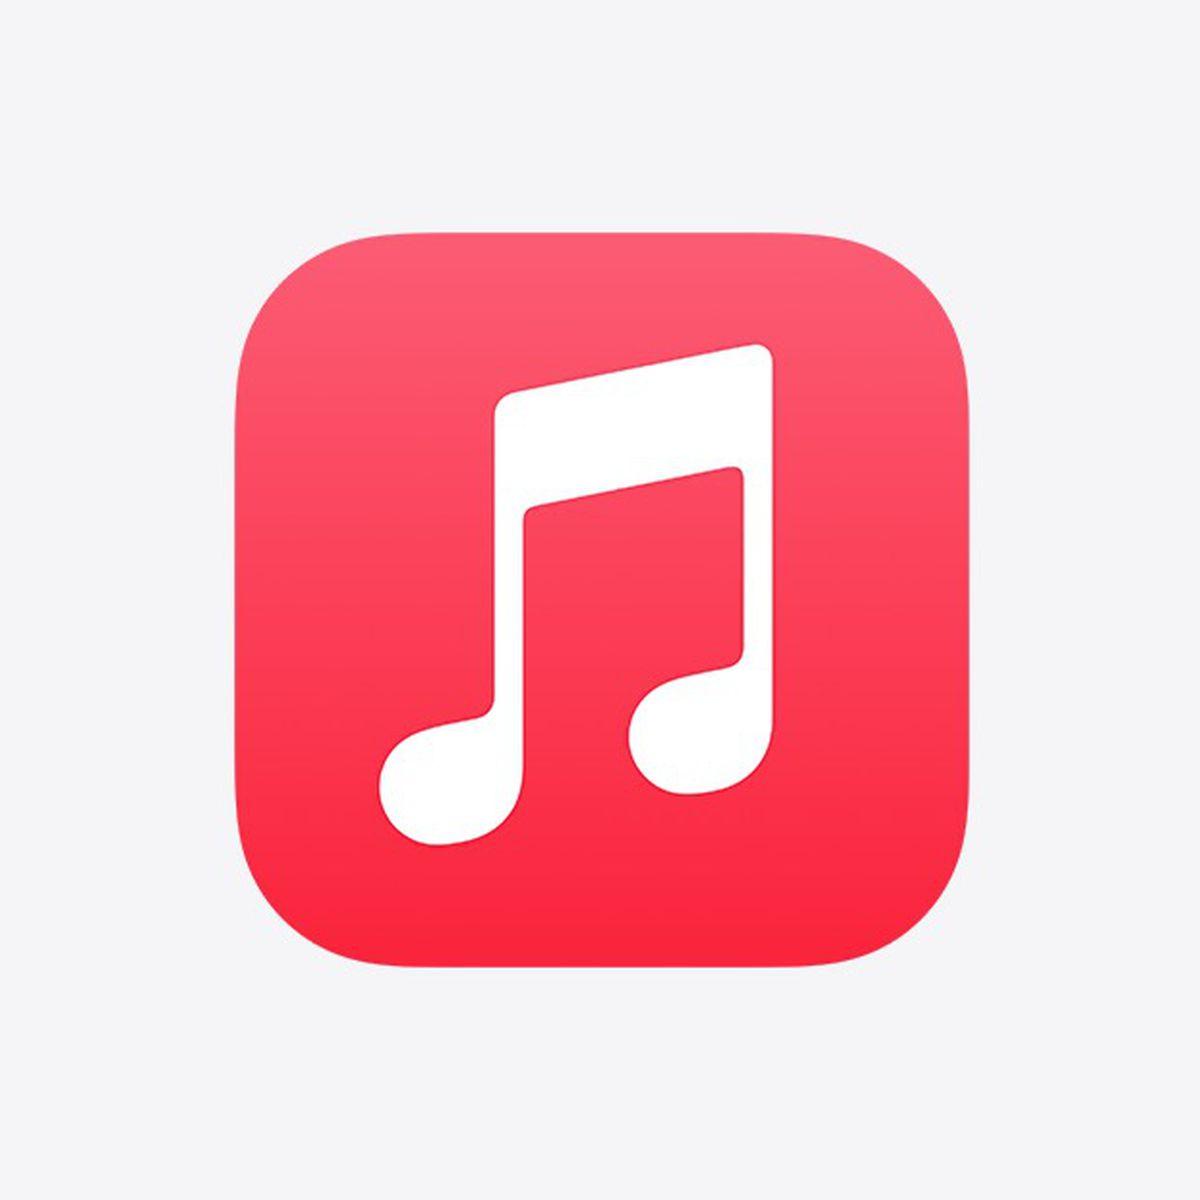 Apple Invests $50 Million in Independent Music Artist Platform UnitedMasters - MacRumors